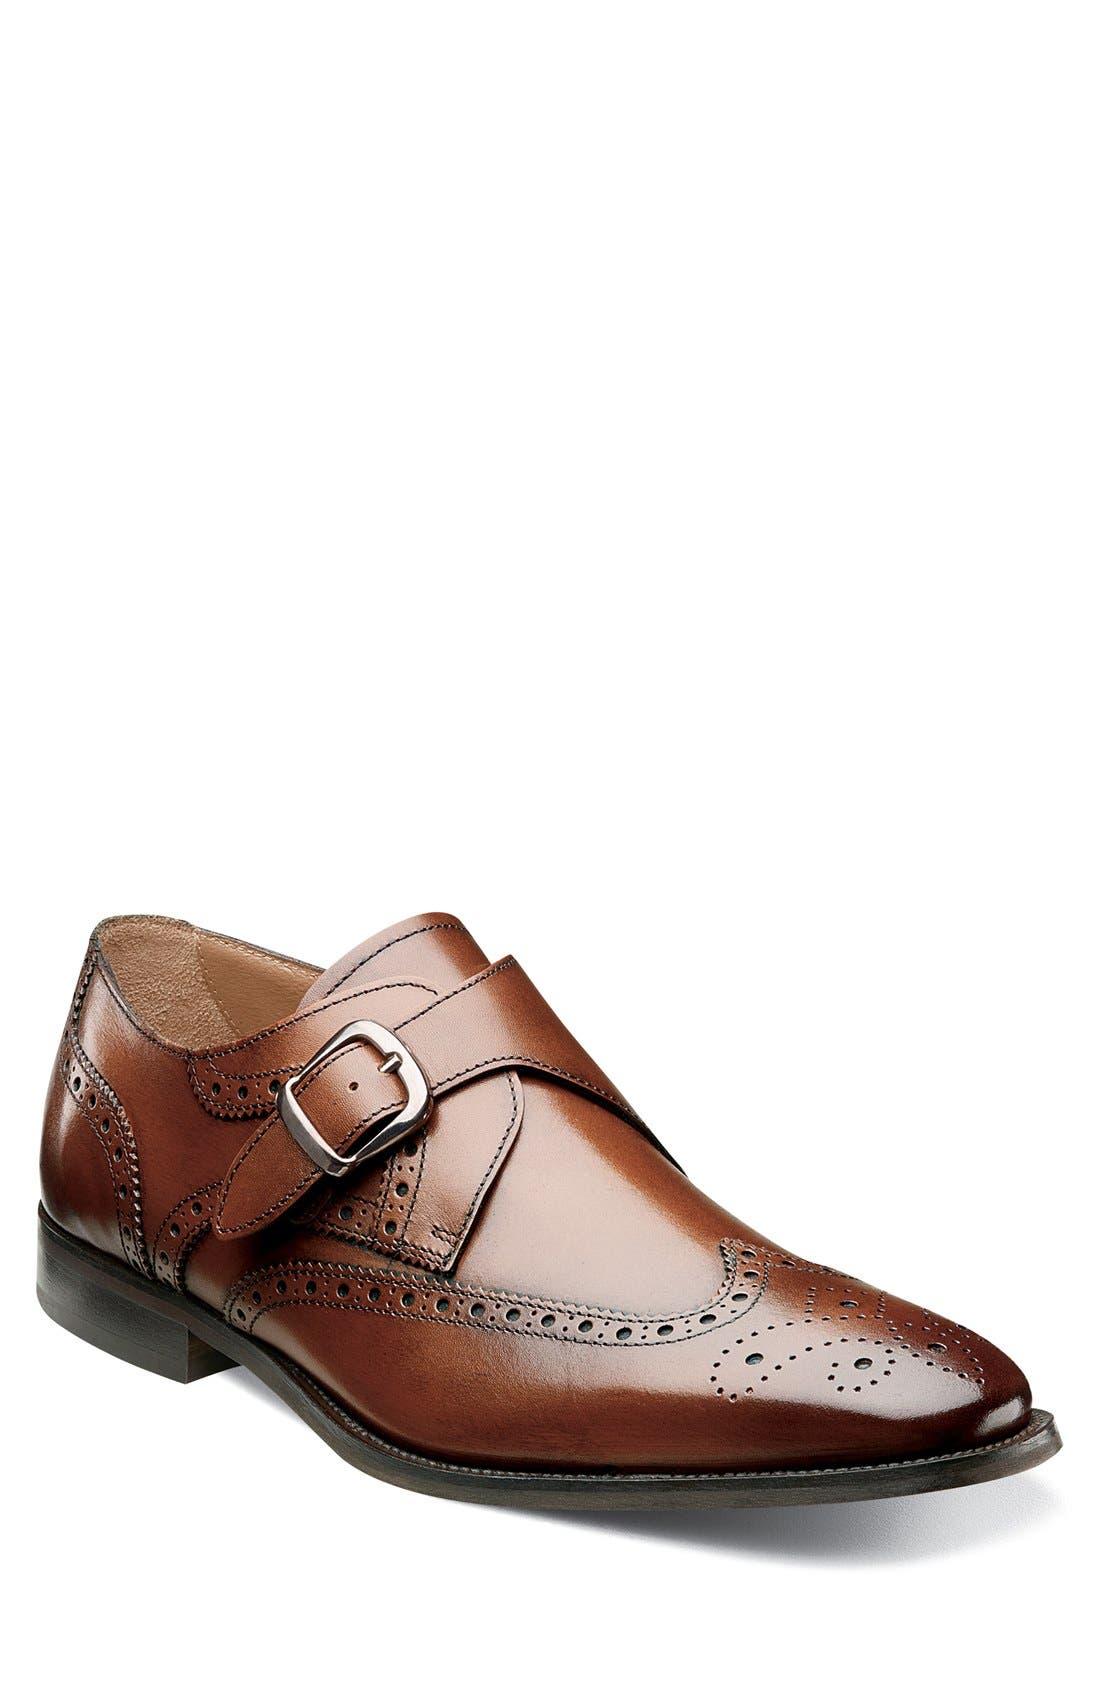 FLORSHEIM, 'Sabato' Wingtip Monk Strap Shoe, Main thumbnail 1, color, MEDIUM BROWN